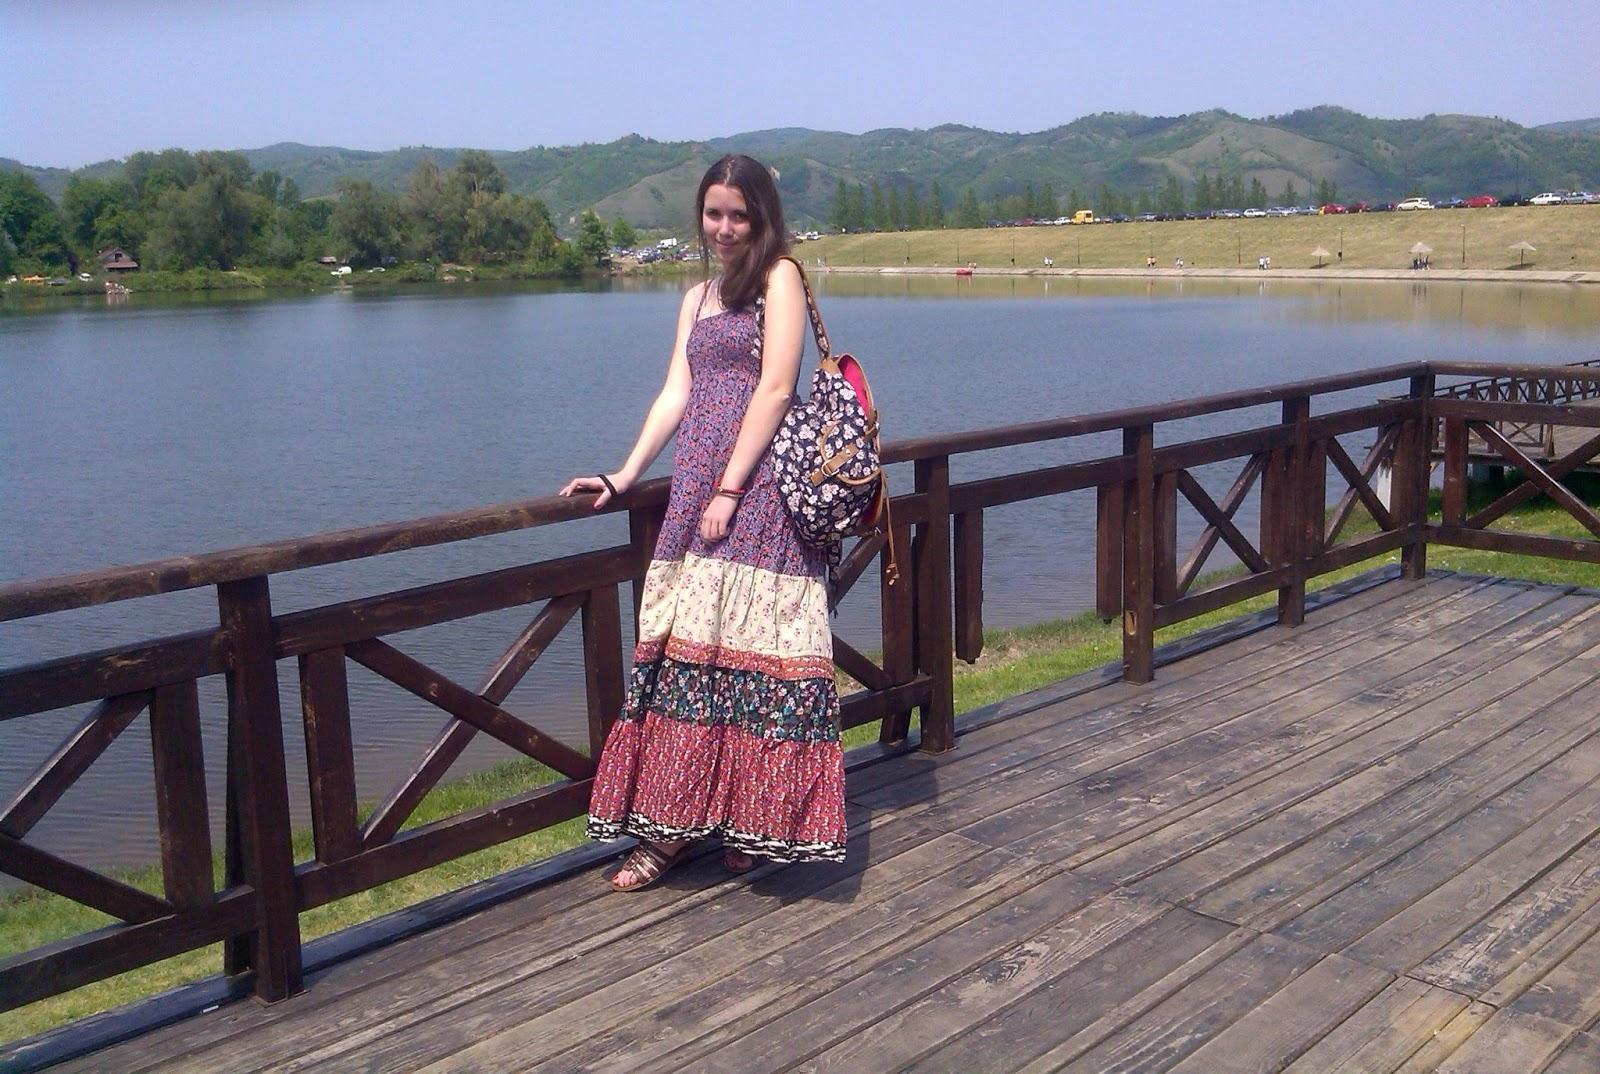 Fashion is art life is fashion silver lake near veliko for Where can i go fishing near me